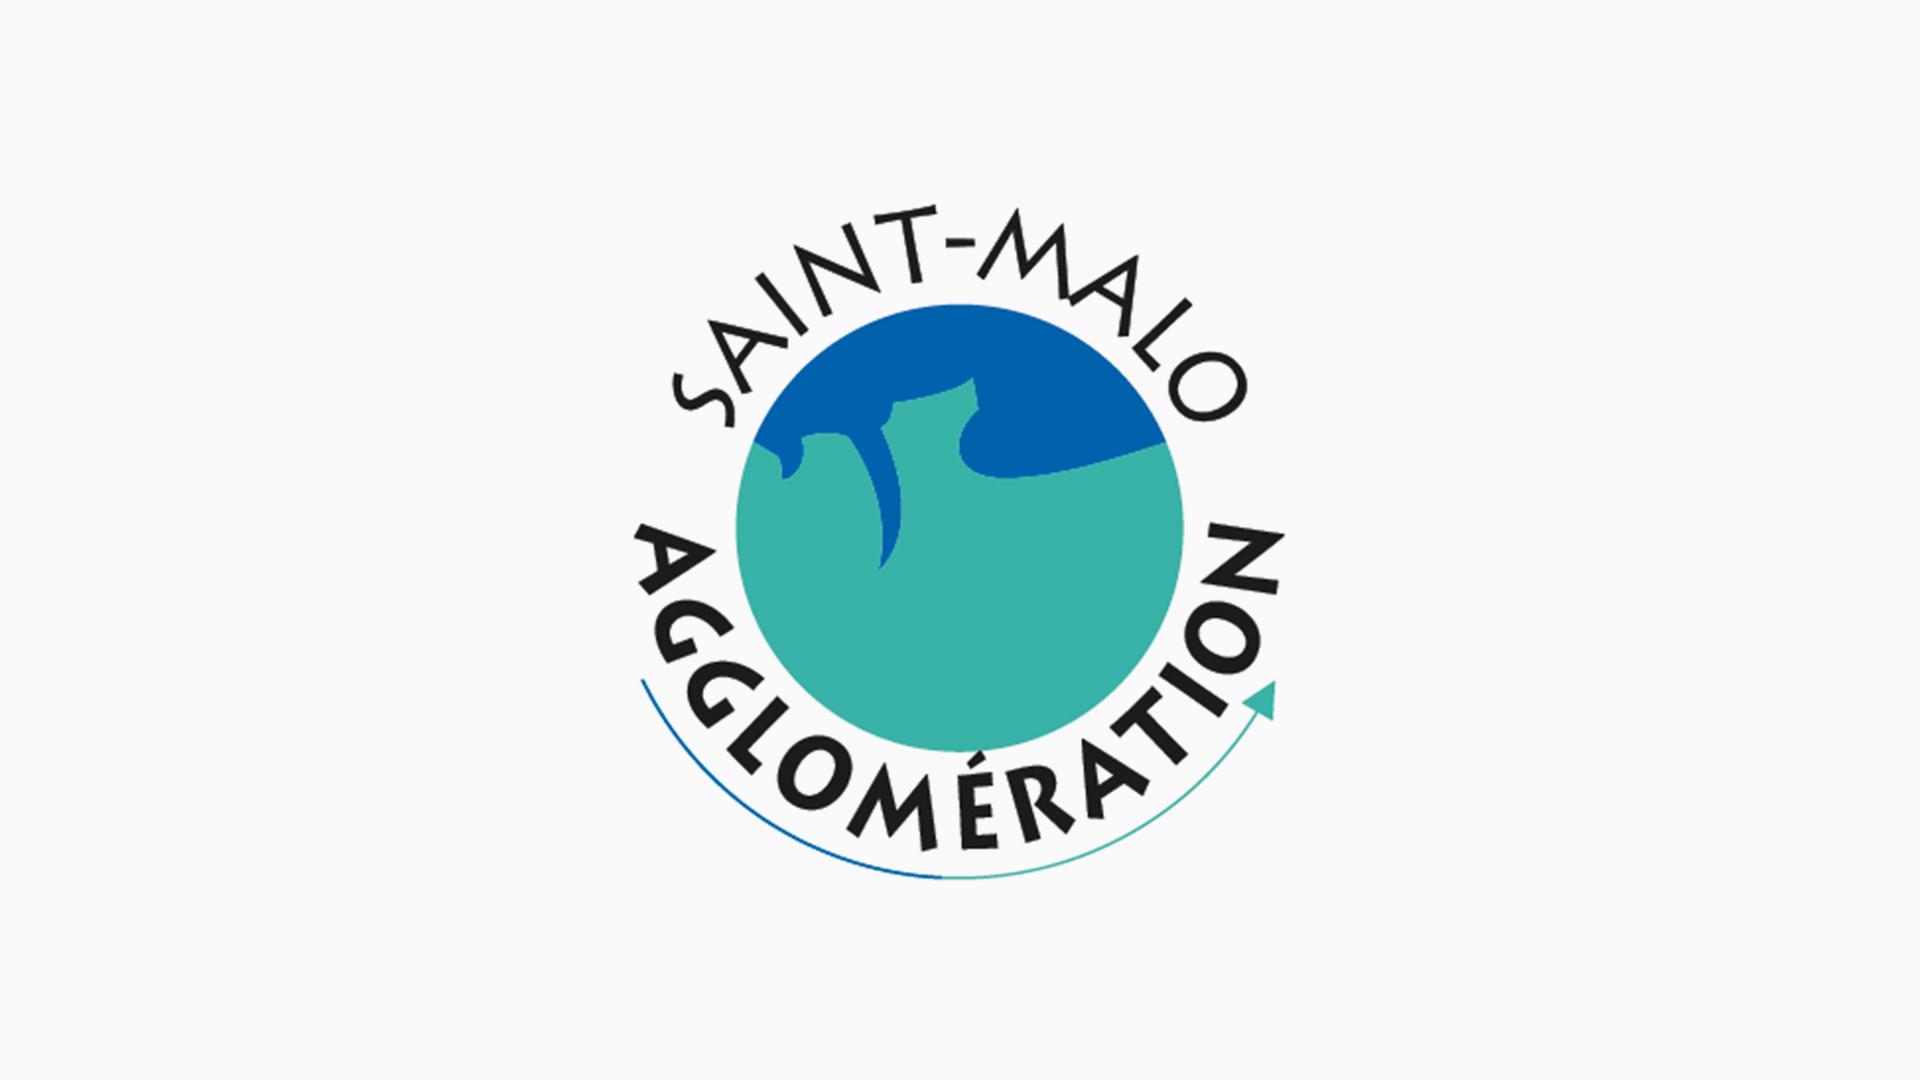 Saint-Malo Agglomération